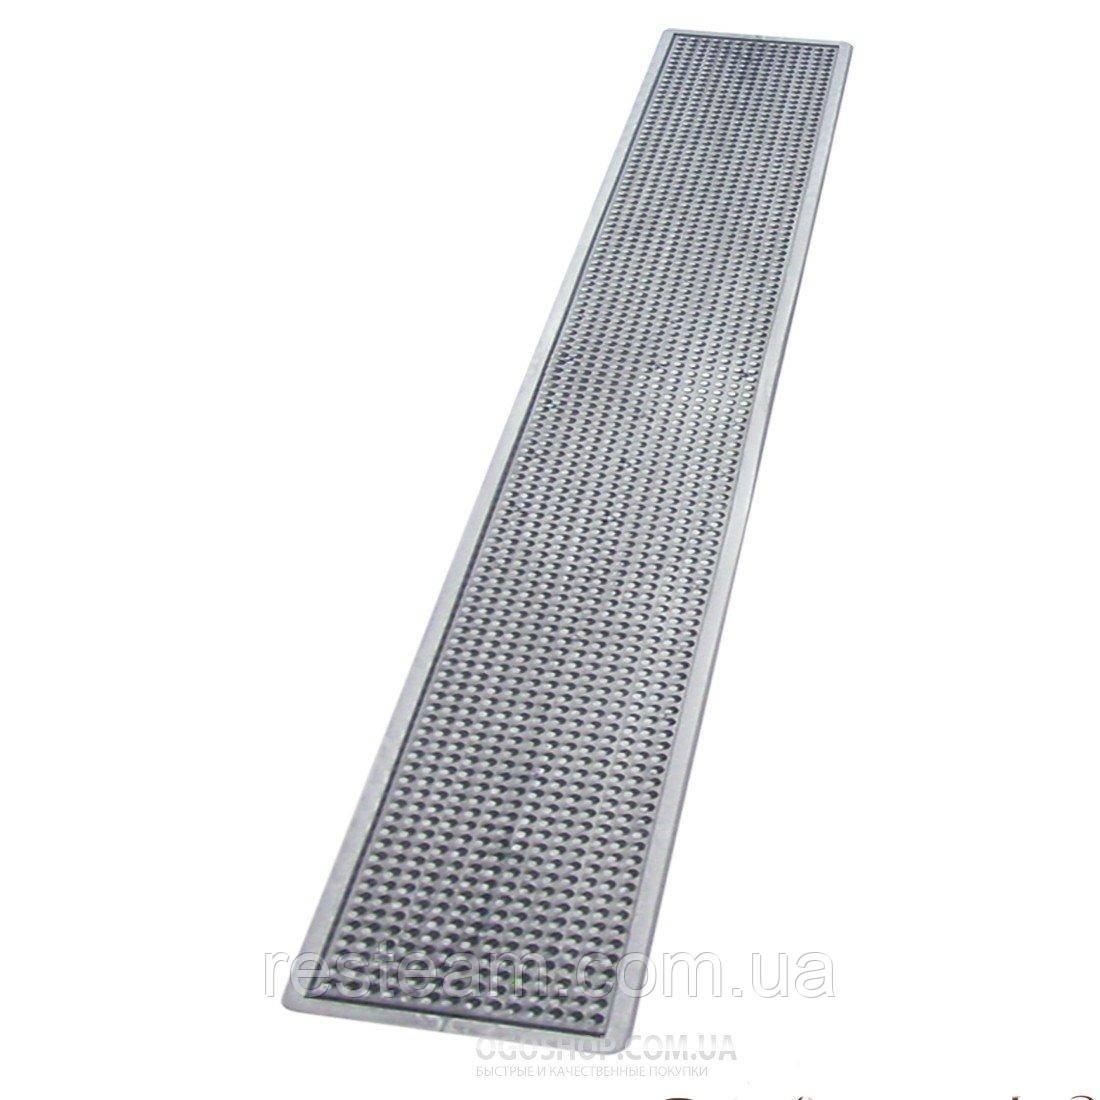 "B008MS Барный коврик 70*10 см серебро ""The Bars"""